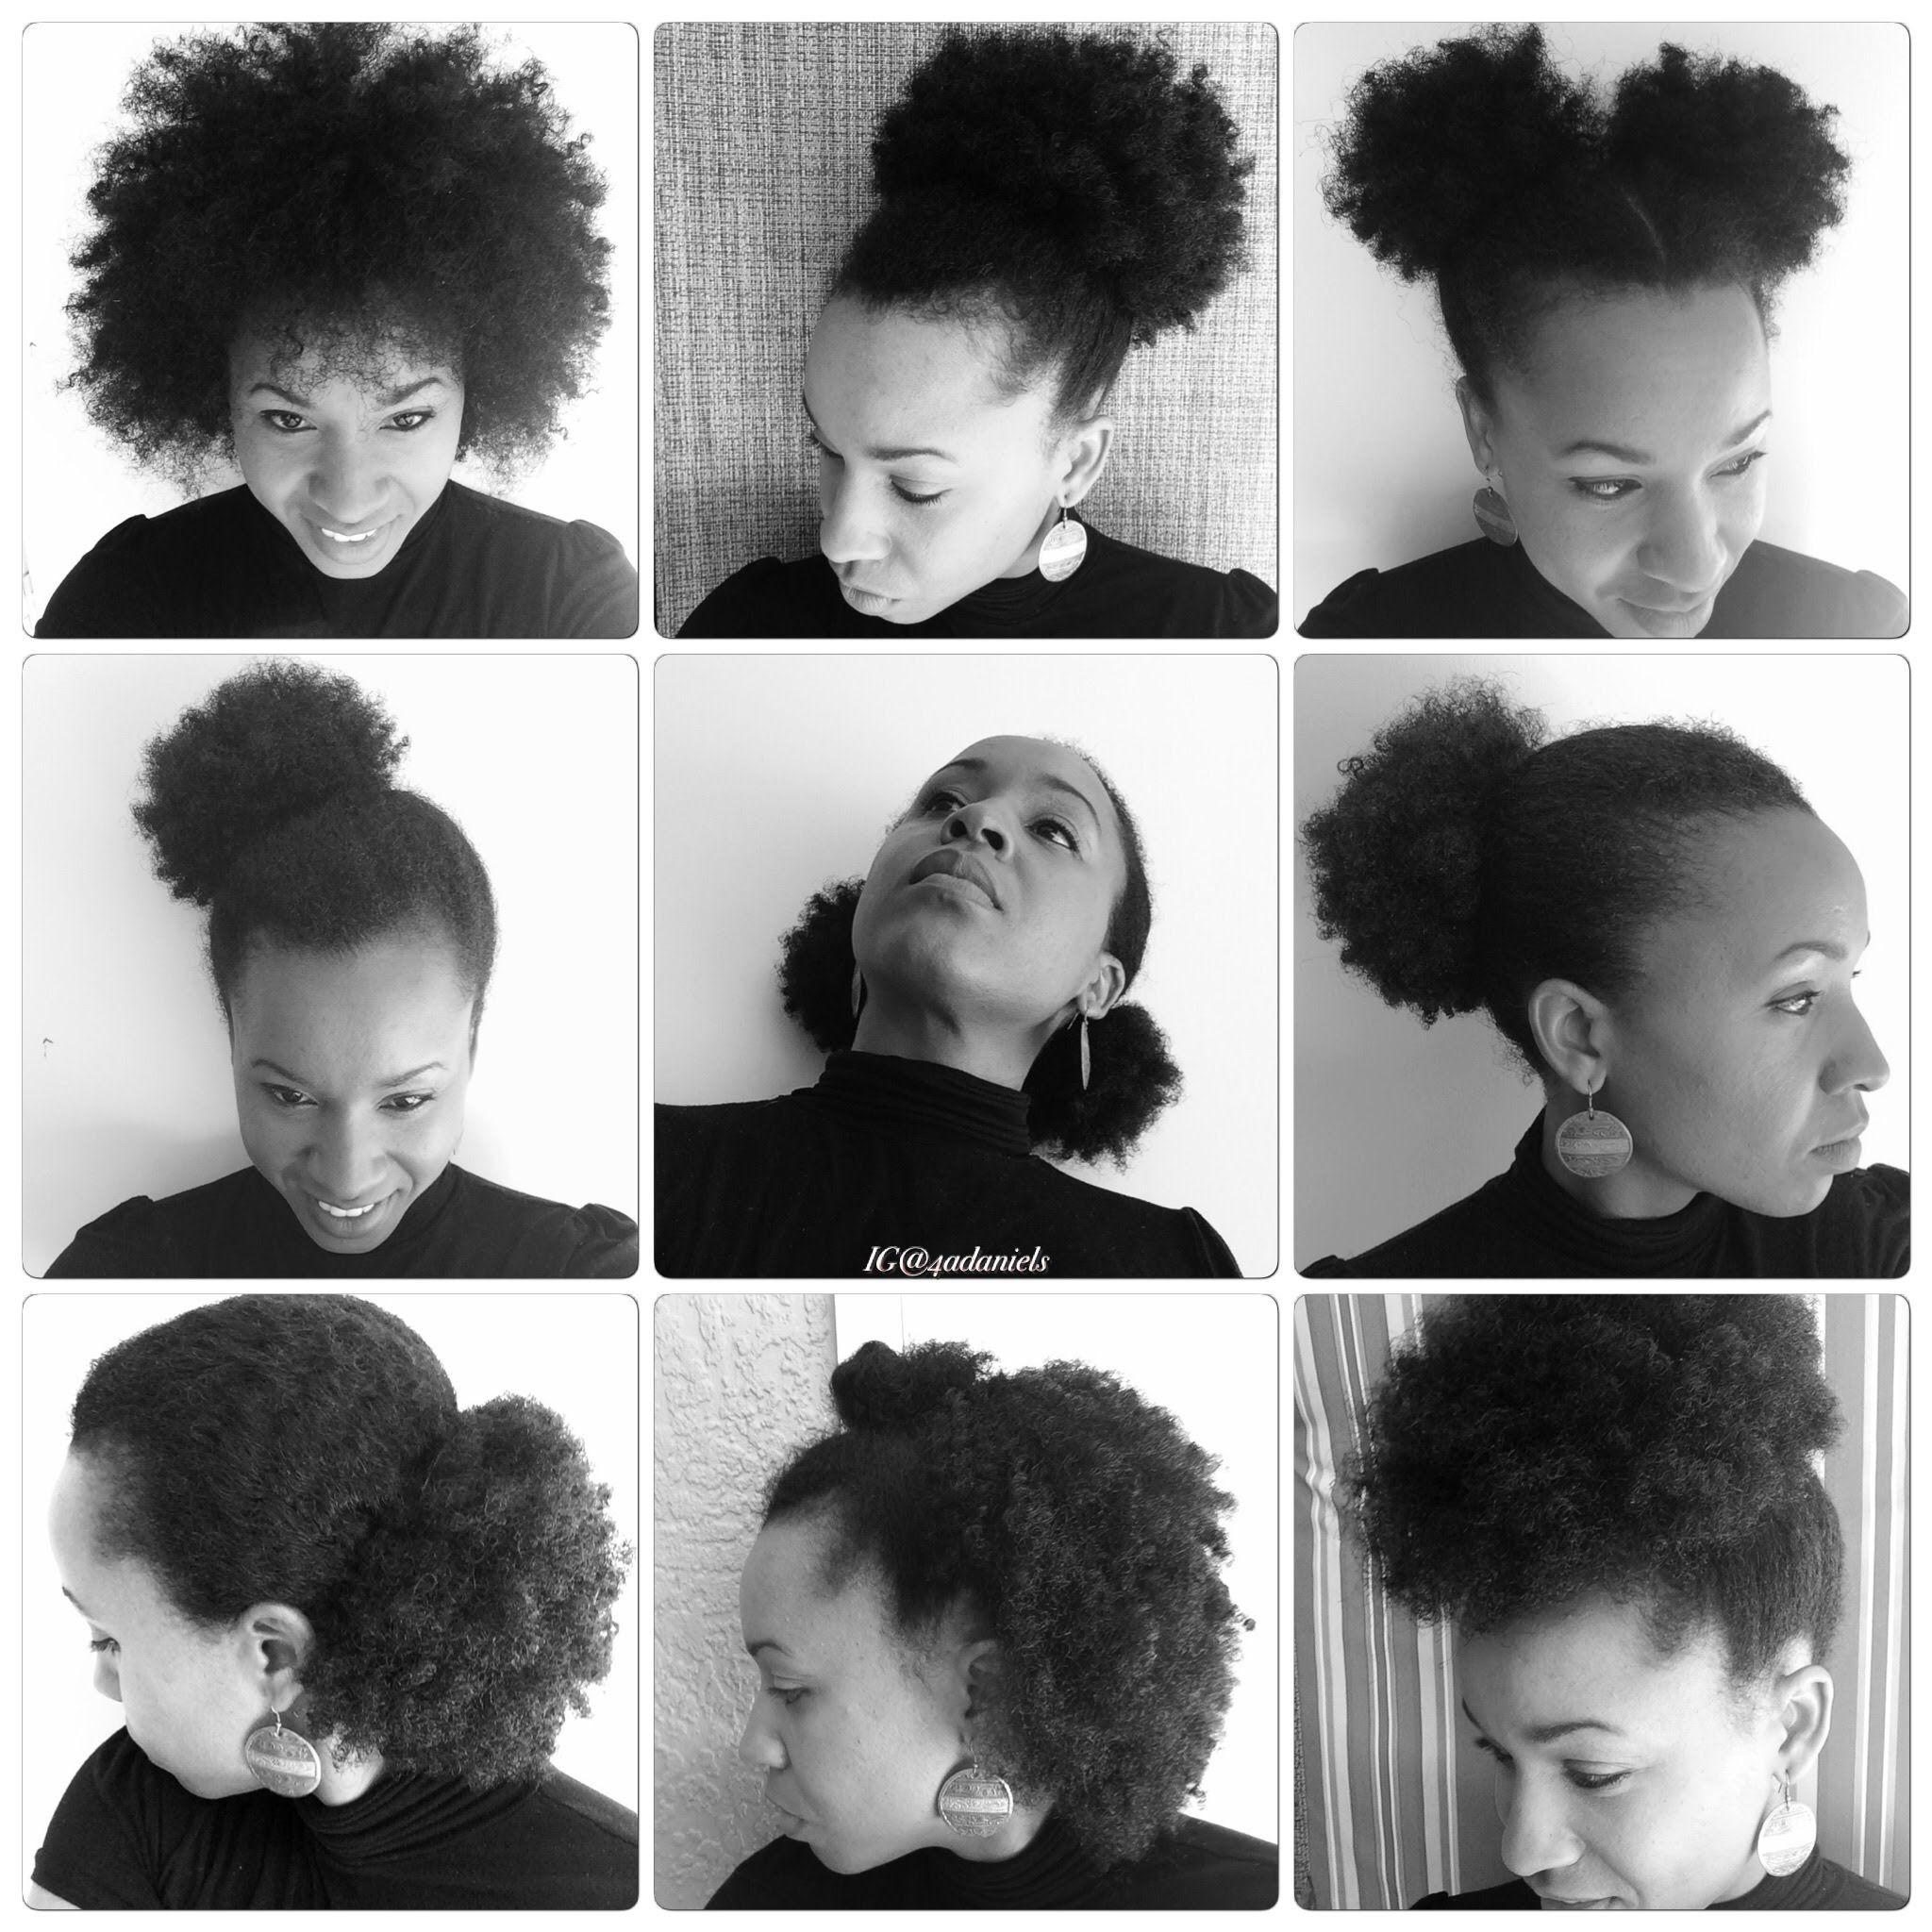 Natural Hair Afro Styles Short Medium Length Medium Natural Hair Styles Natural Hair Styles Medium Length Natural Hairstyles